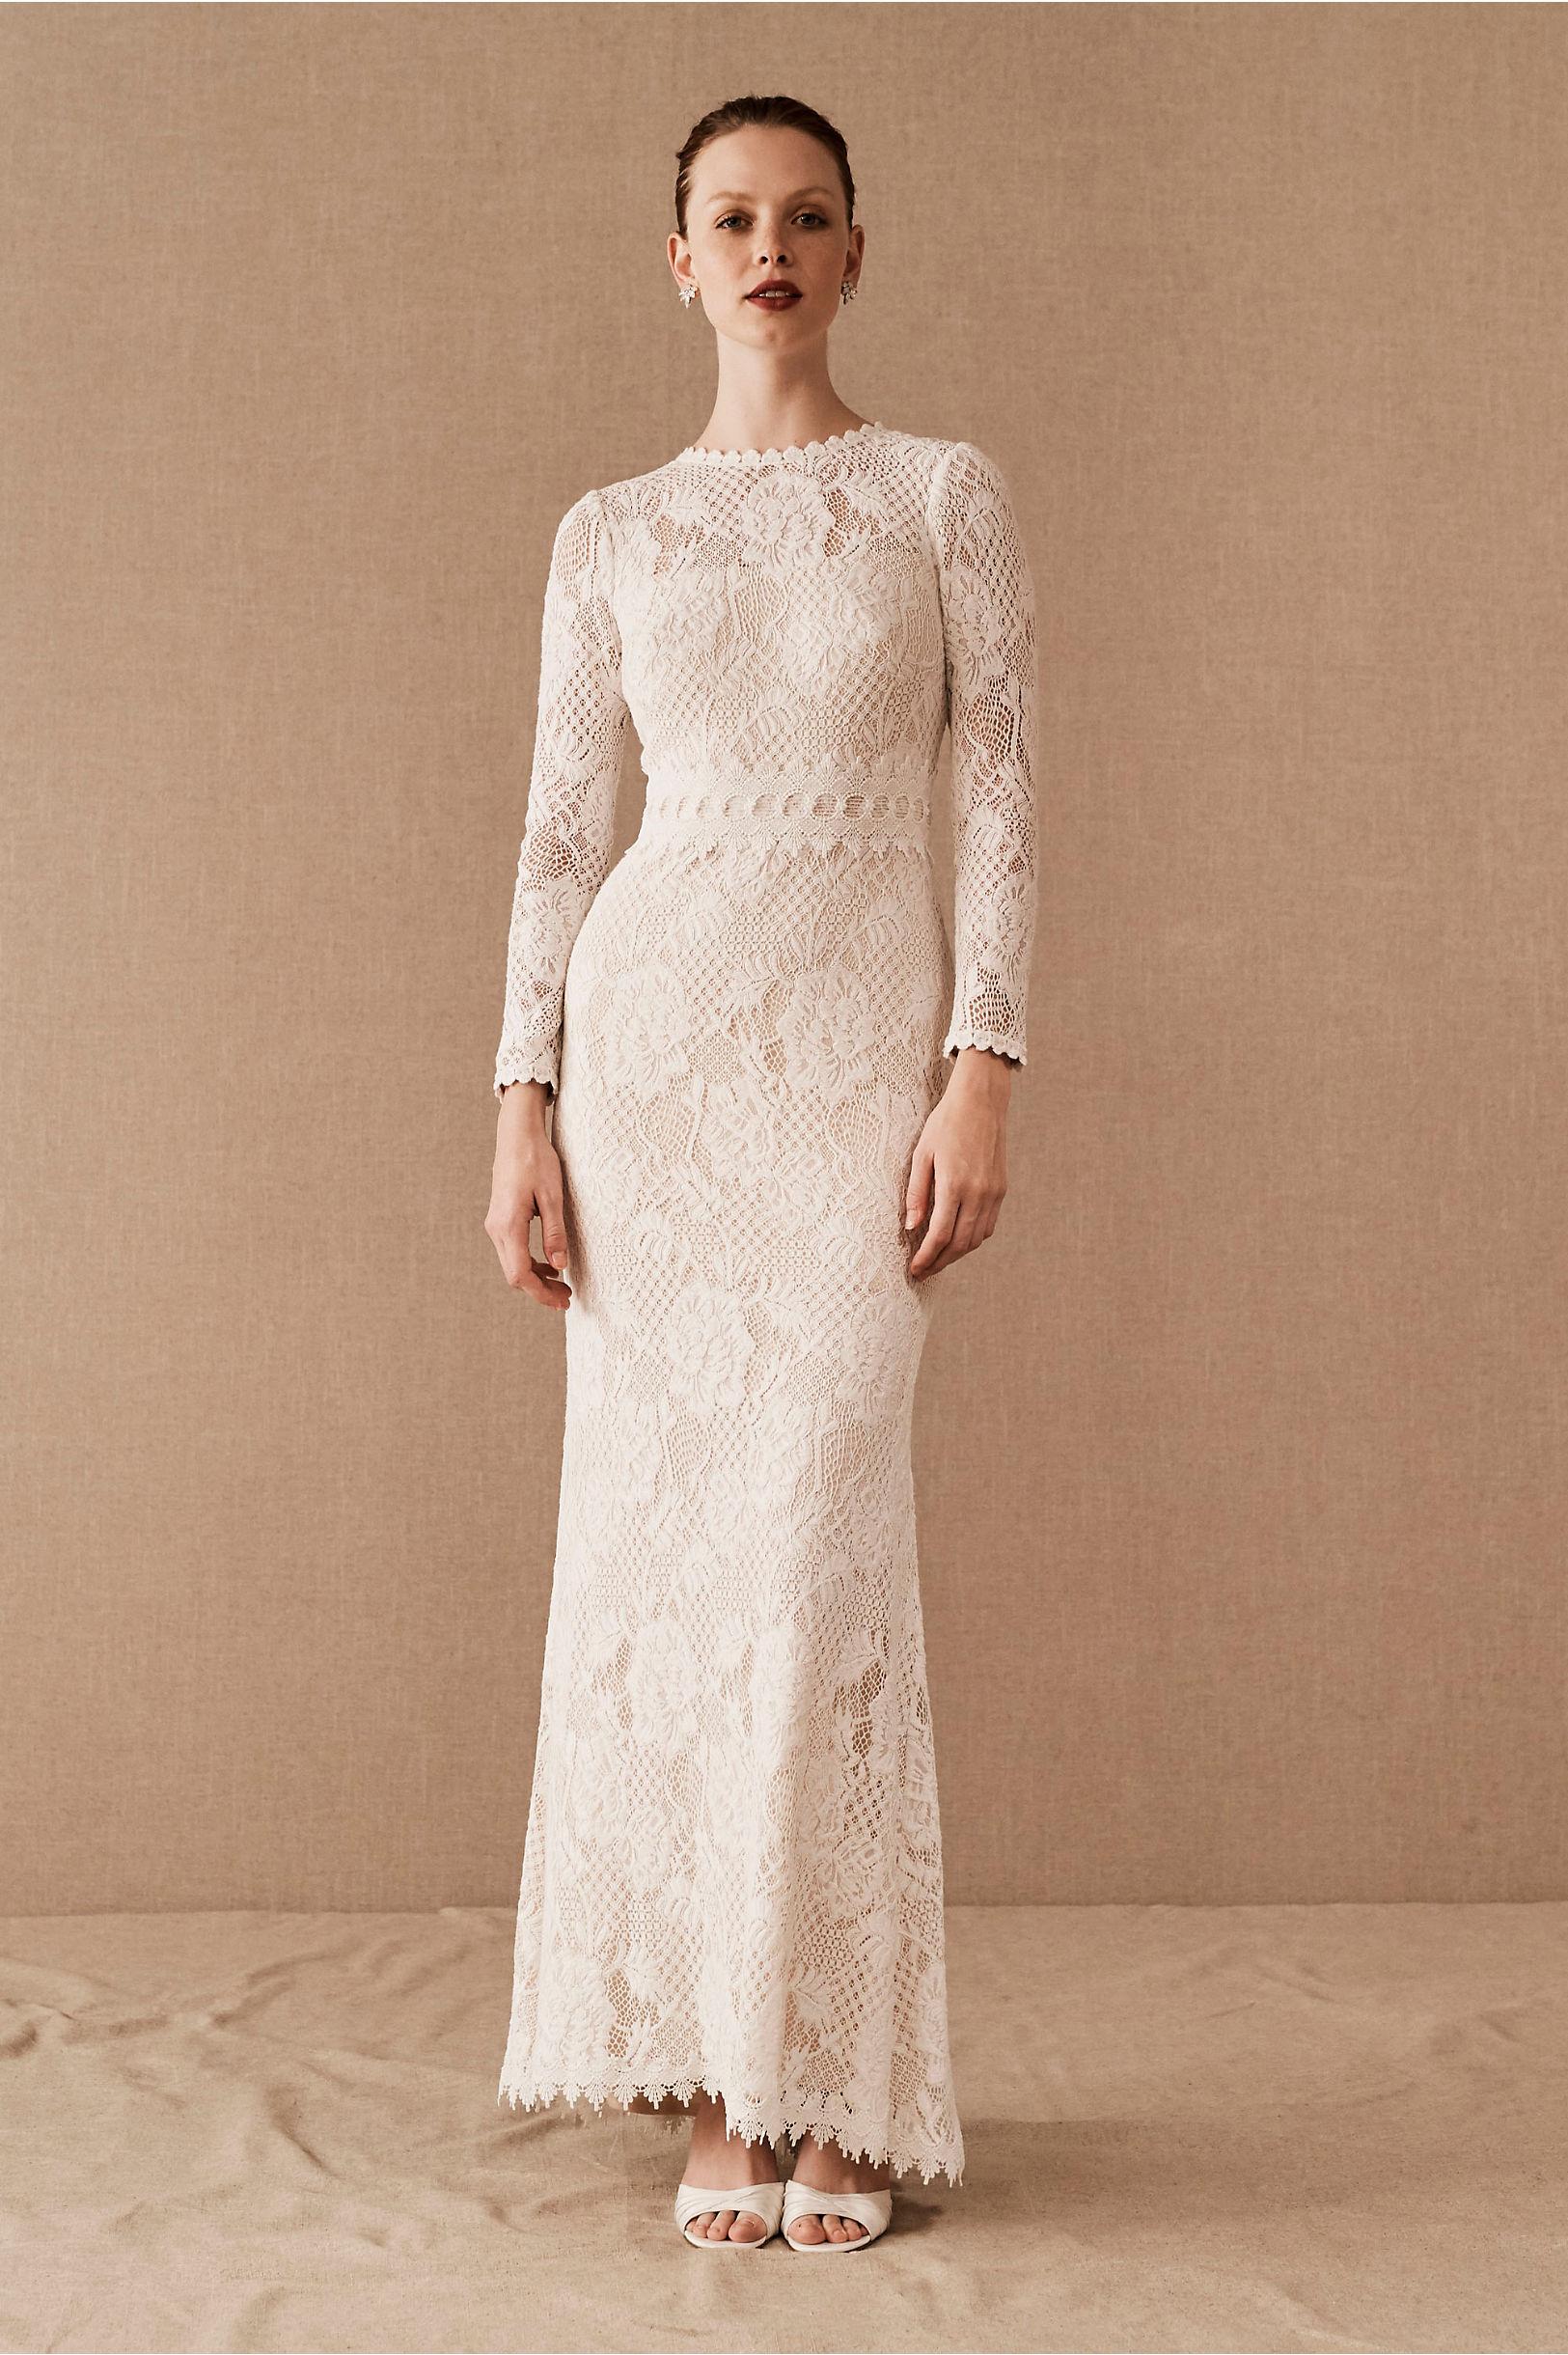 60s Wedding Dresses | 70s Wedding Dresses Tenley Gown $650.00 AT vintagedancer.com